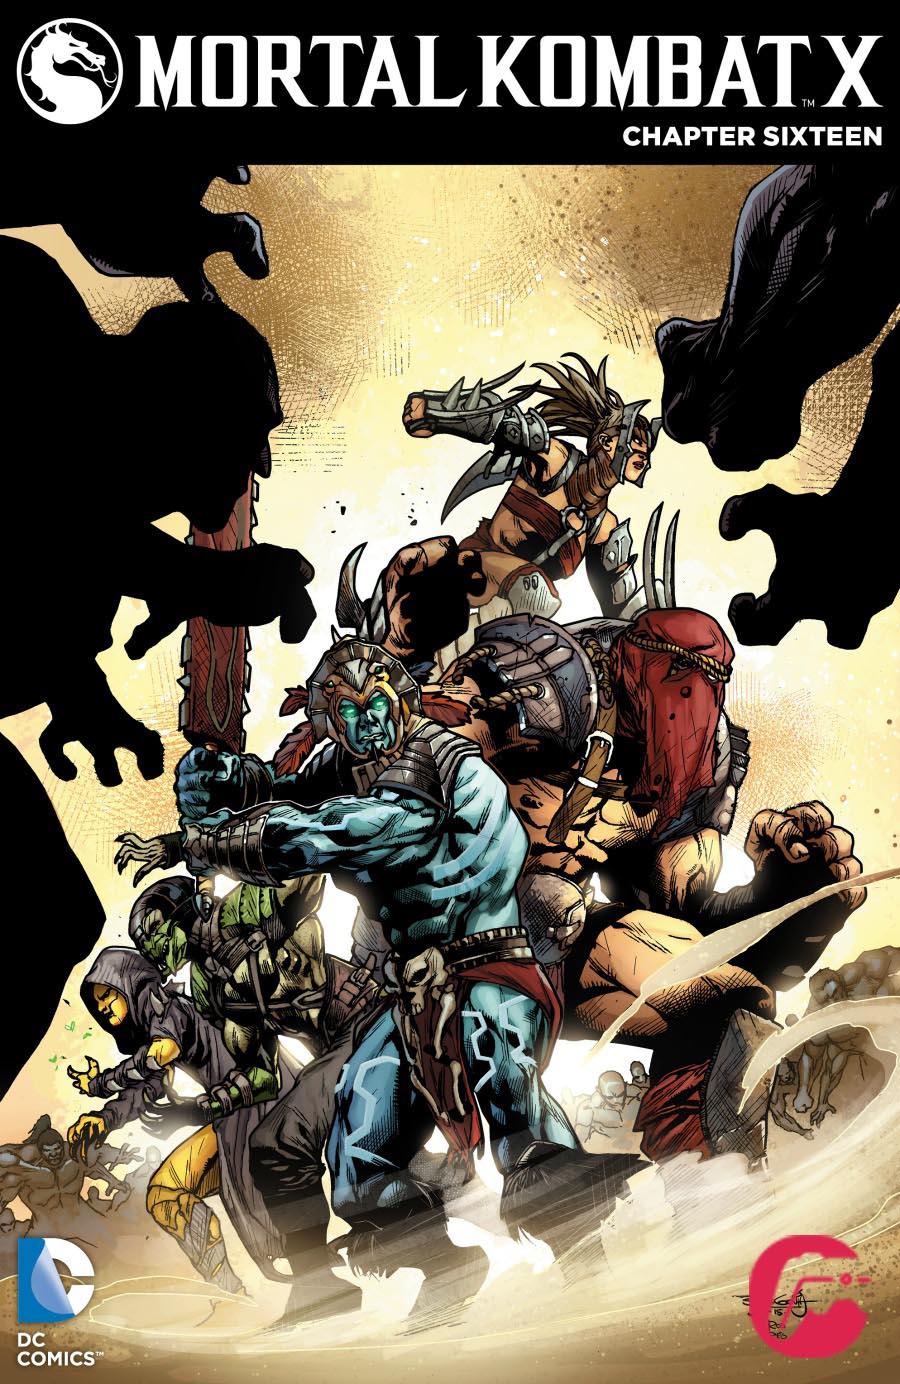 cOV1 قسمت شانزدهم کامیک بوک Mortal Kombat X | ترجمه ی اختصاصی گیمفا